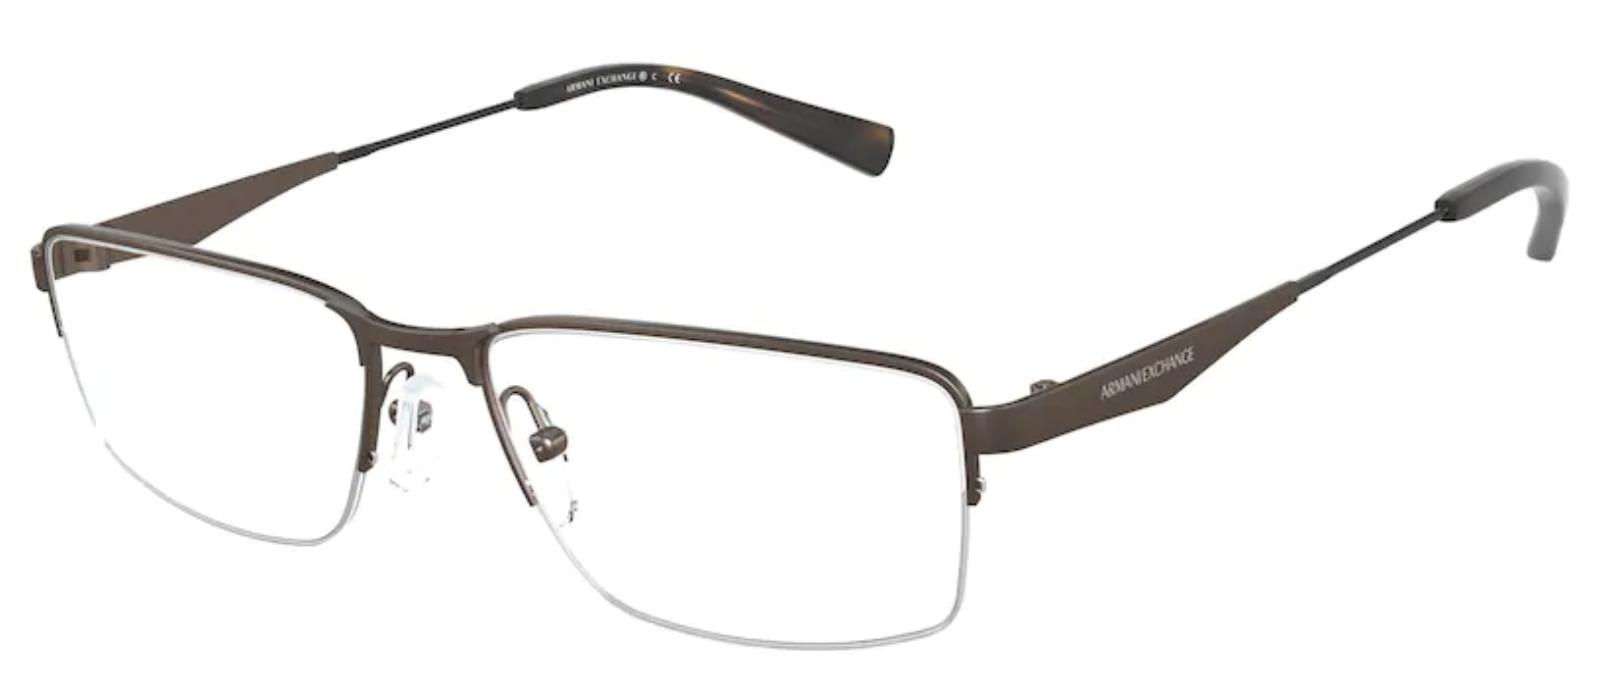 Óculos de Grau Armani Exchange Masculino AX 1038 6114 Tam.56